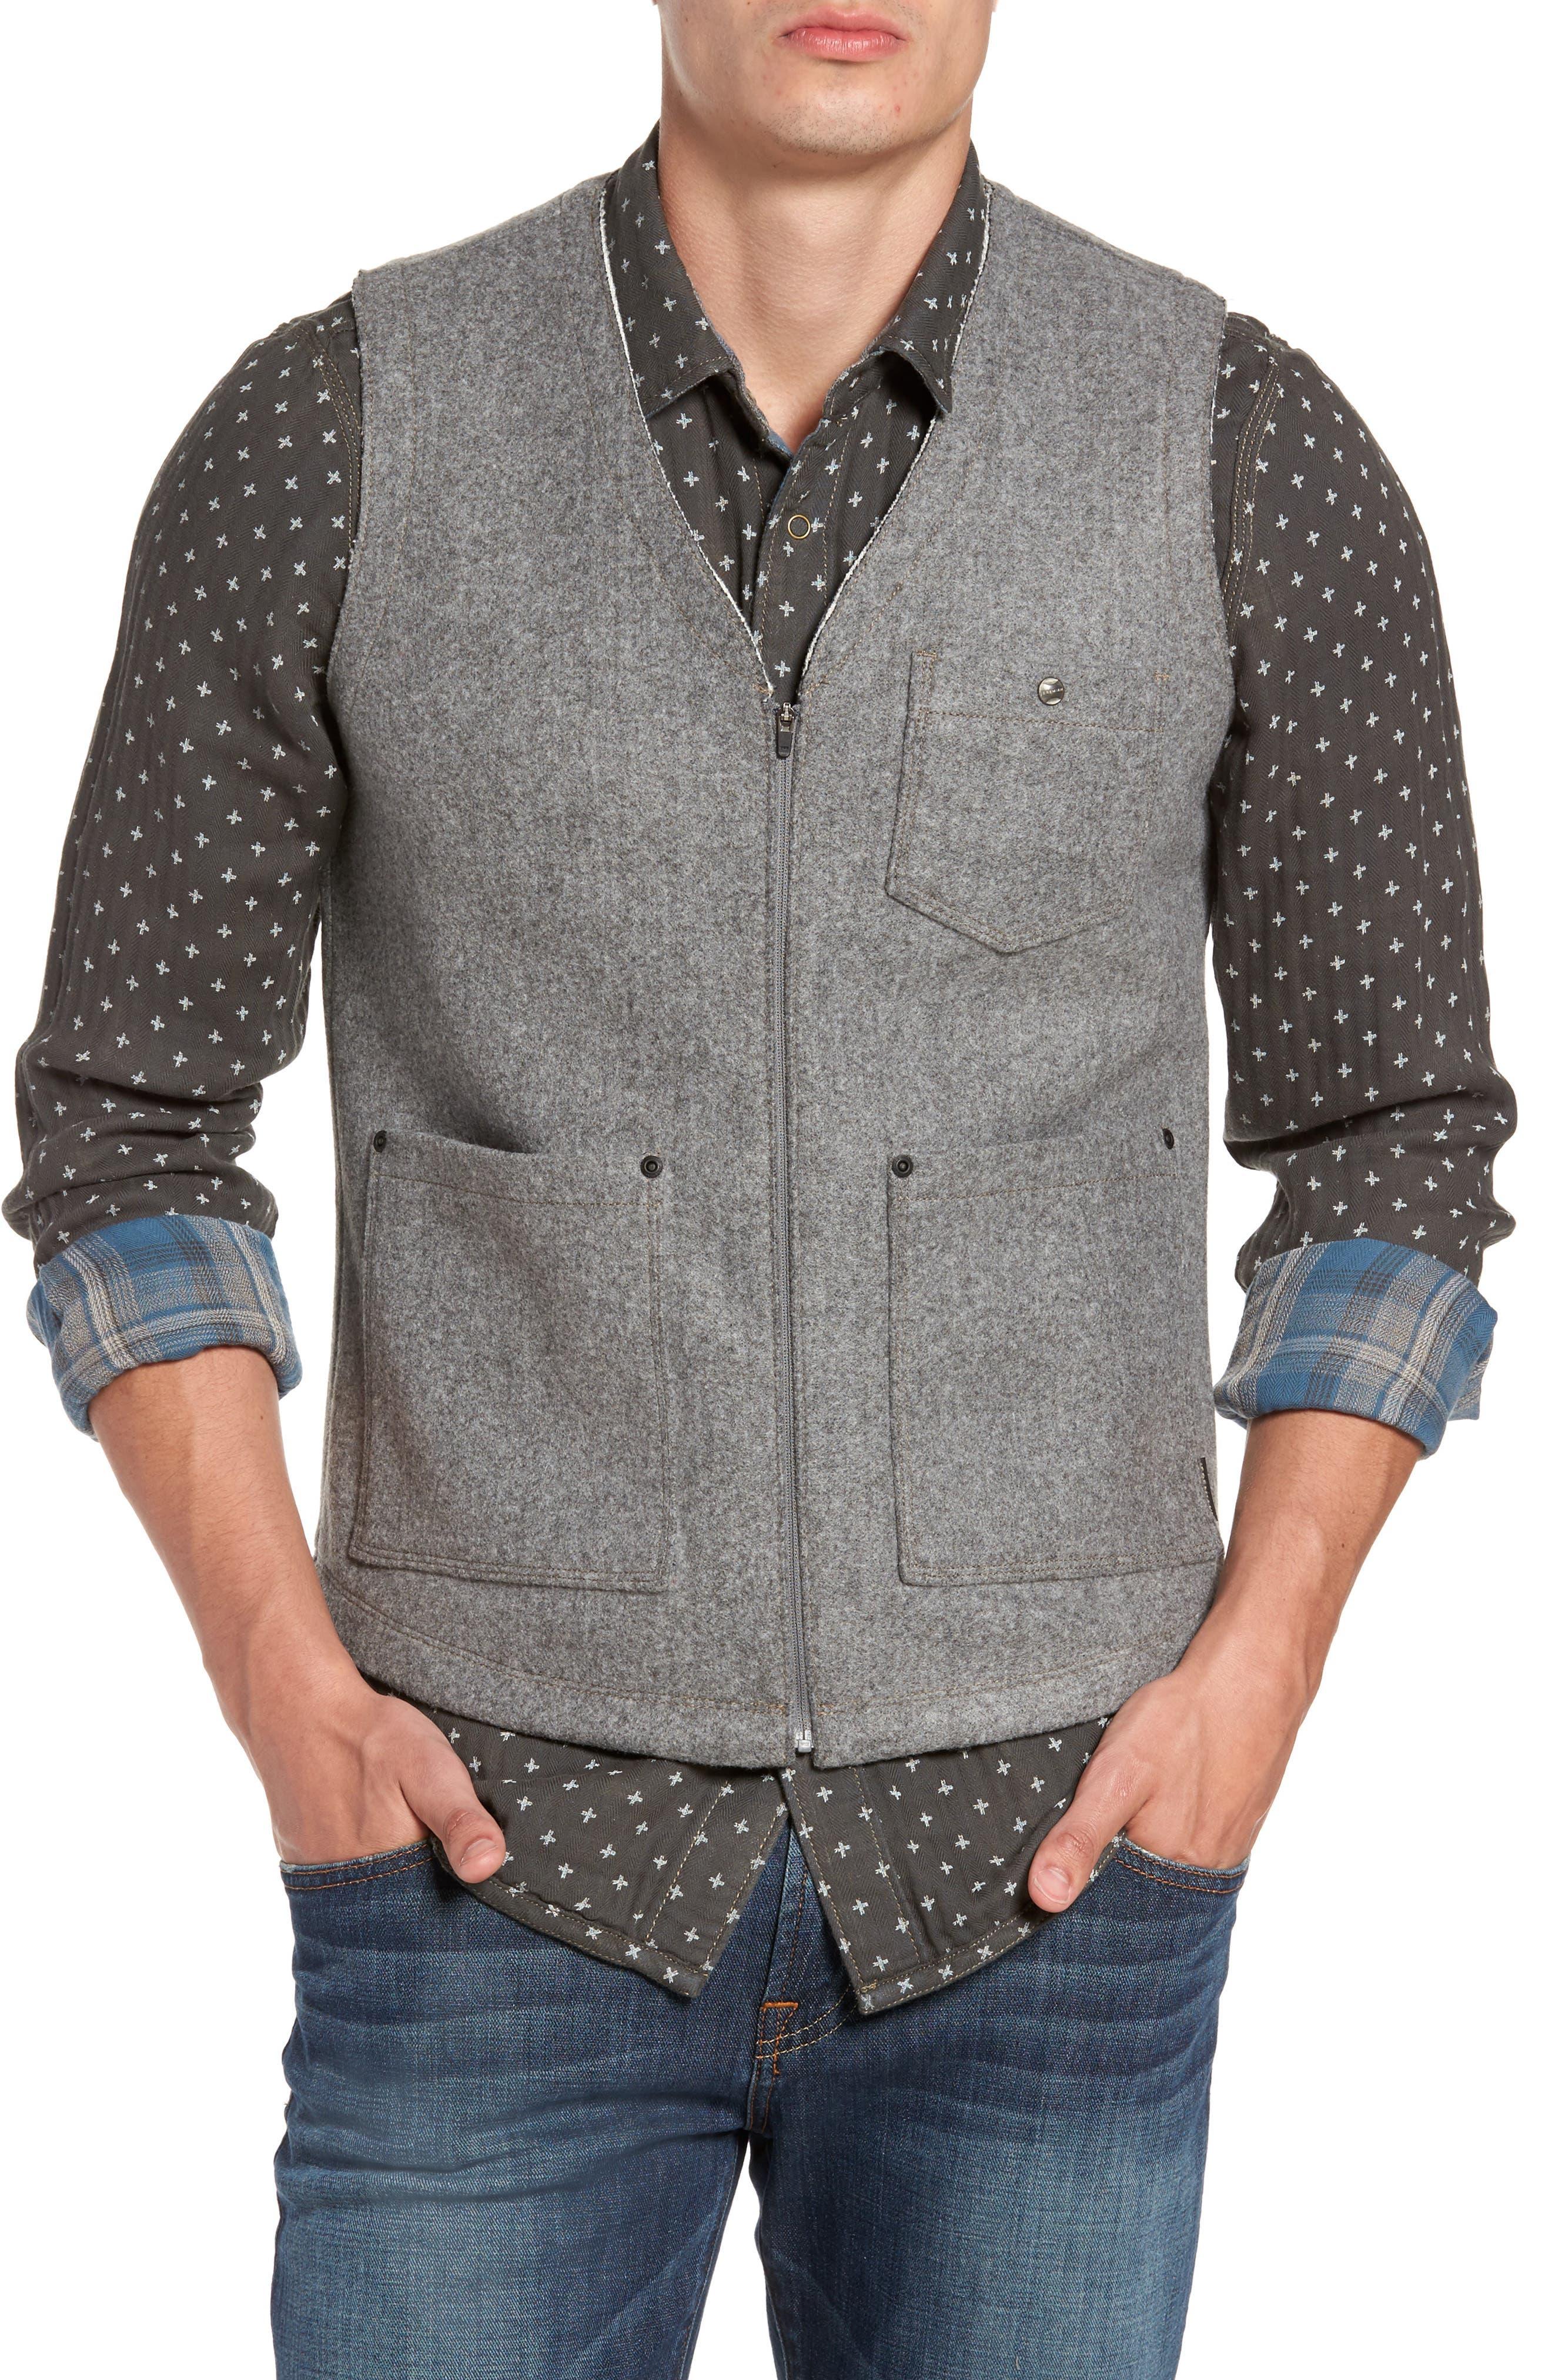 Jeremiah Cambria Heathered Zip Vest, Grey